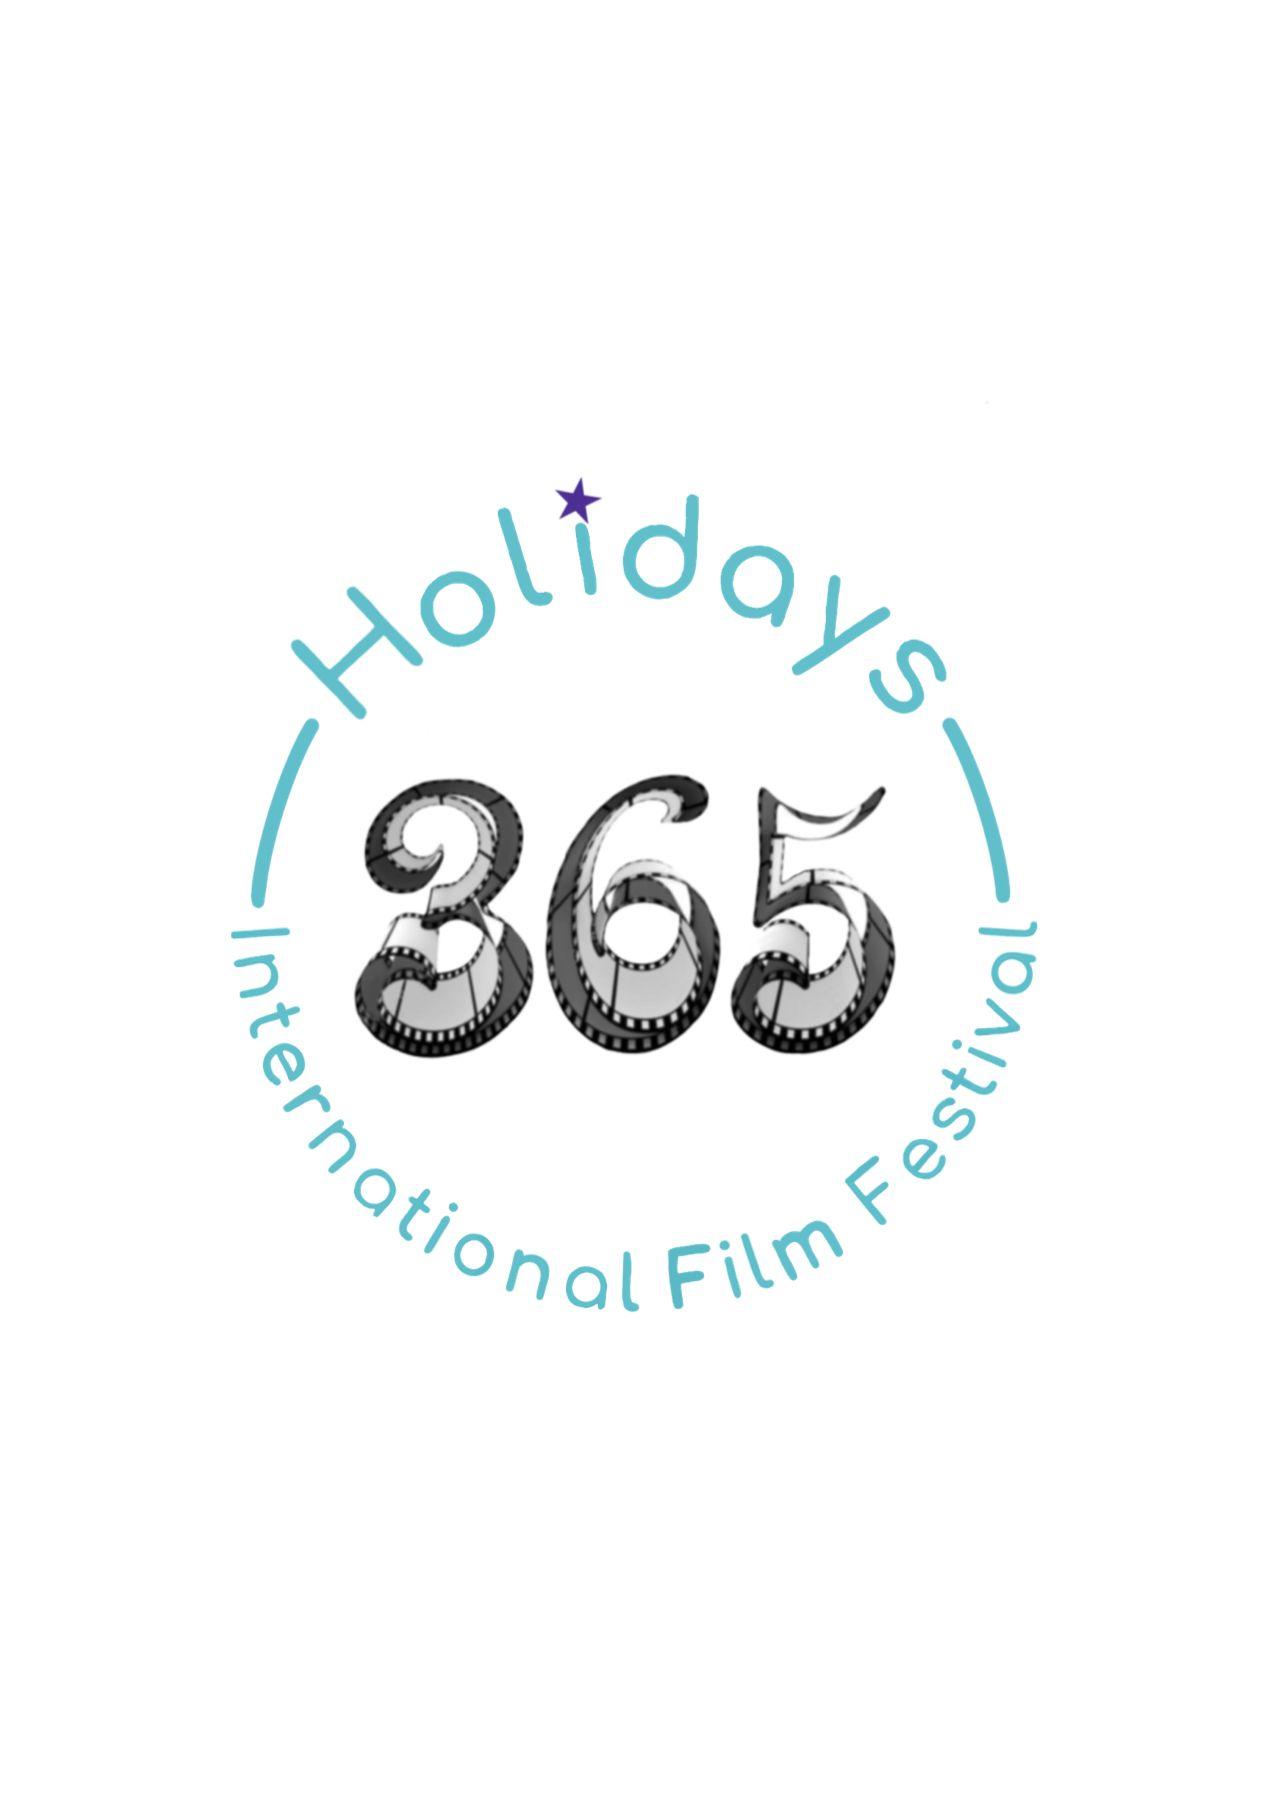 Holidays365 International Film Festival™ Logo